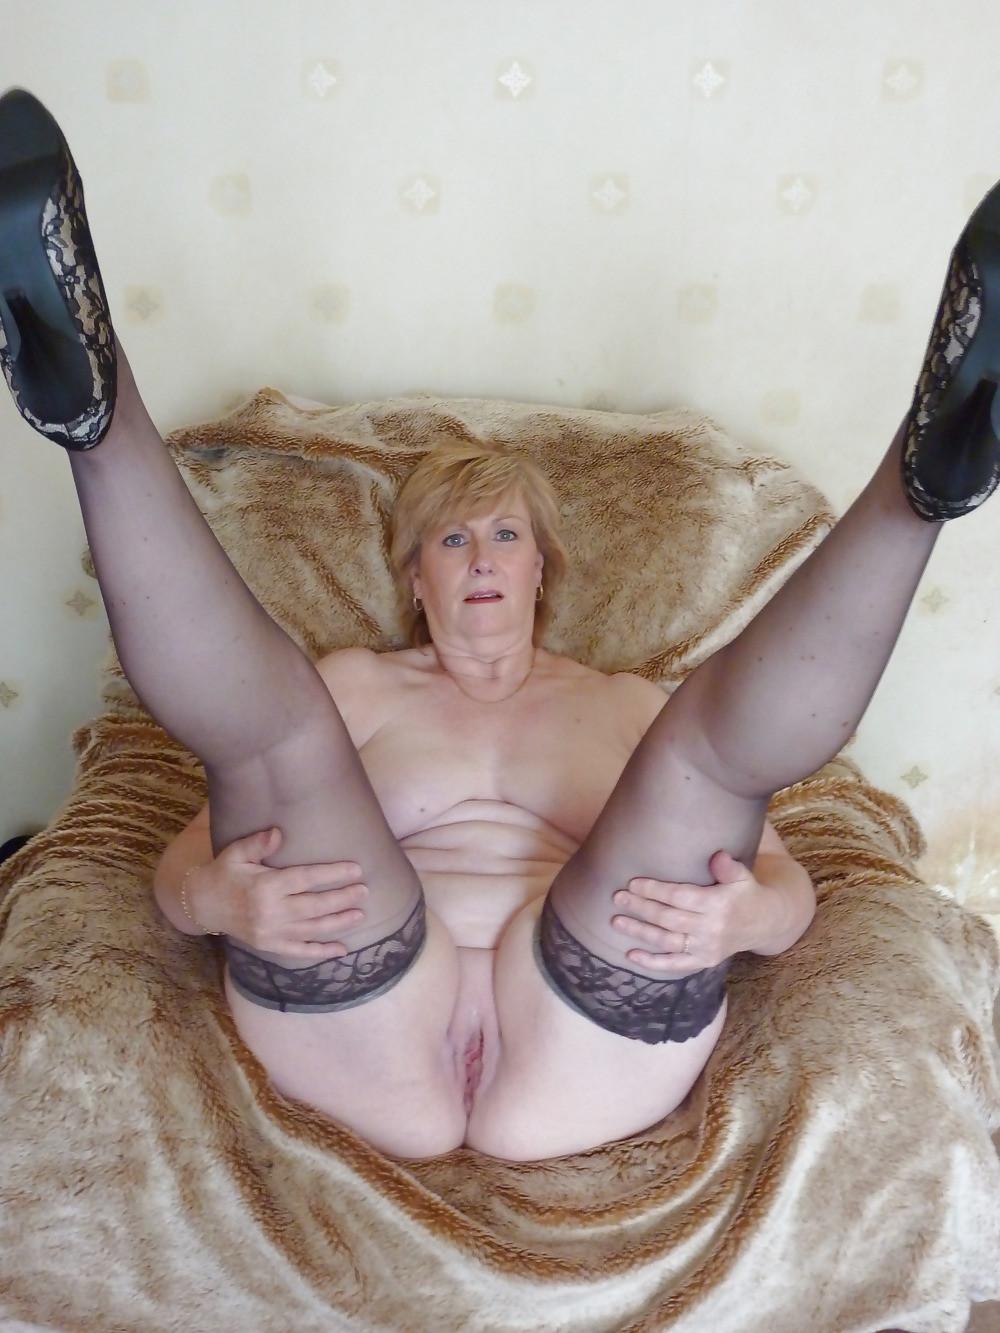 Beautyful curvy nude girl